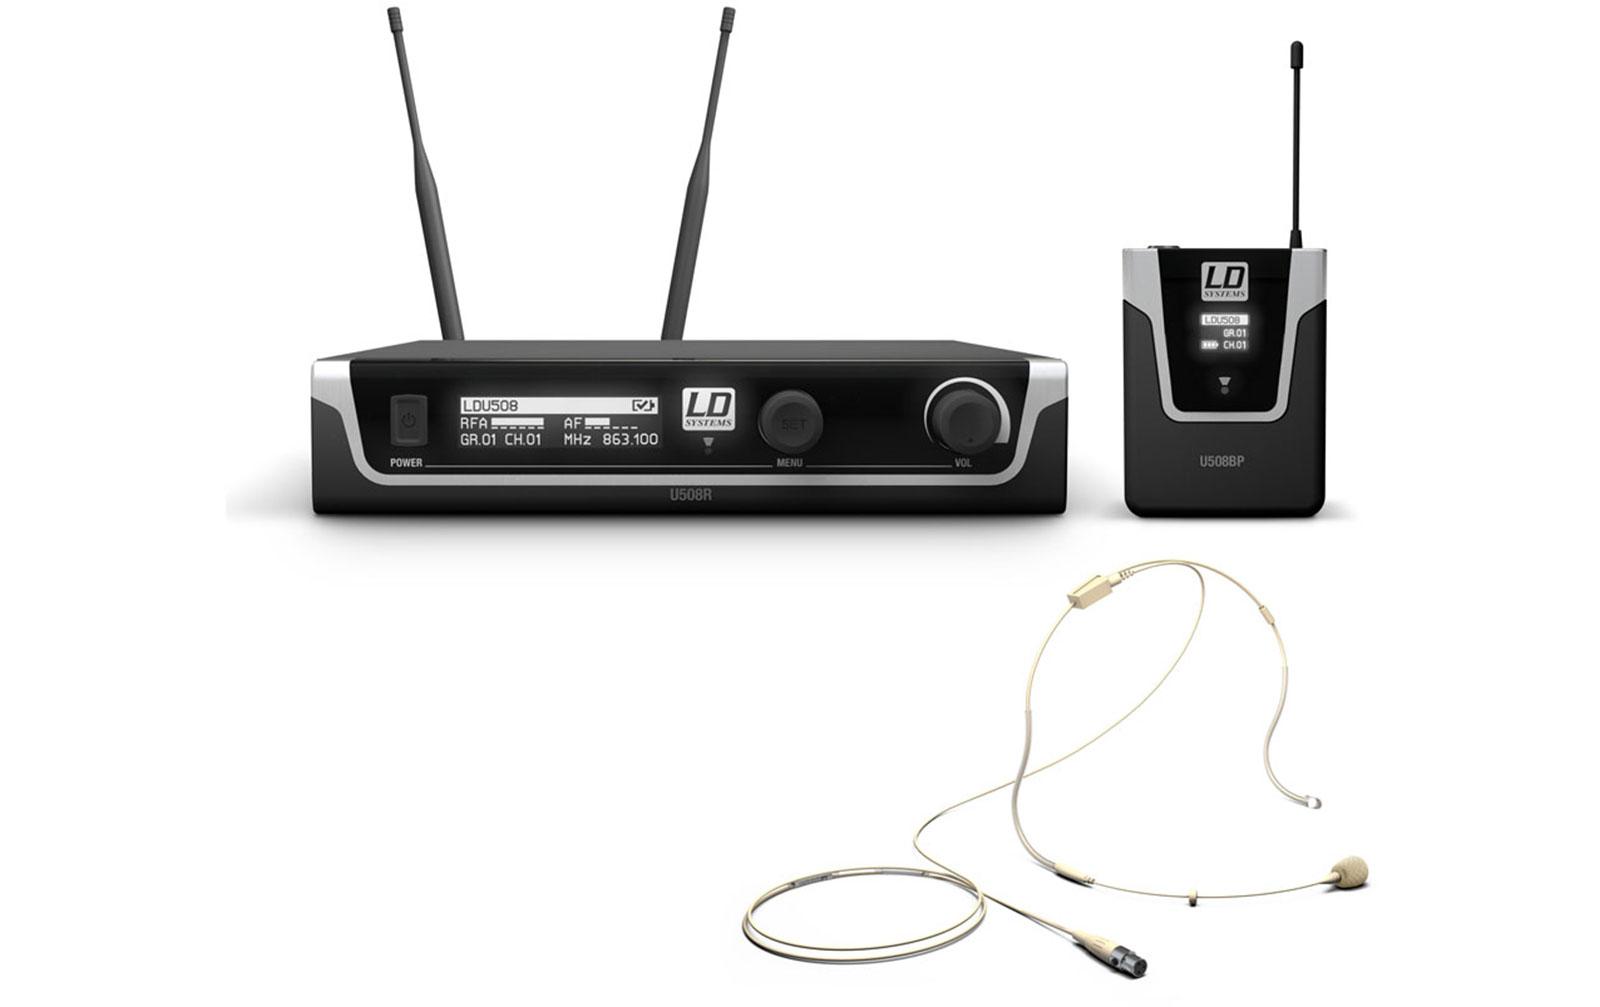 ld-systems-u508-bphh-funkmikrofon-system-mit-bodypack-und-headset-beigefarben